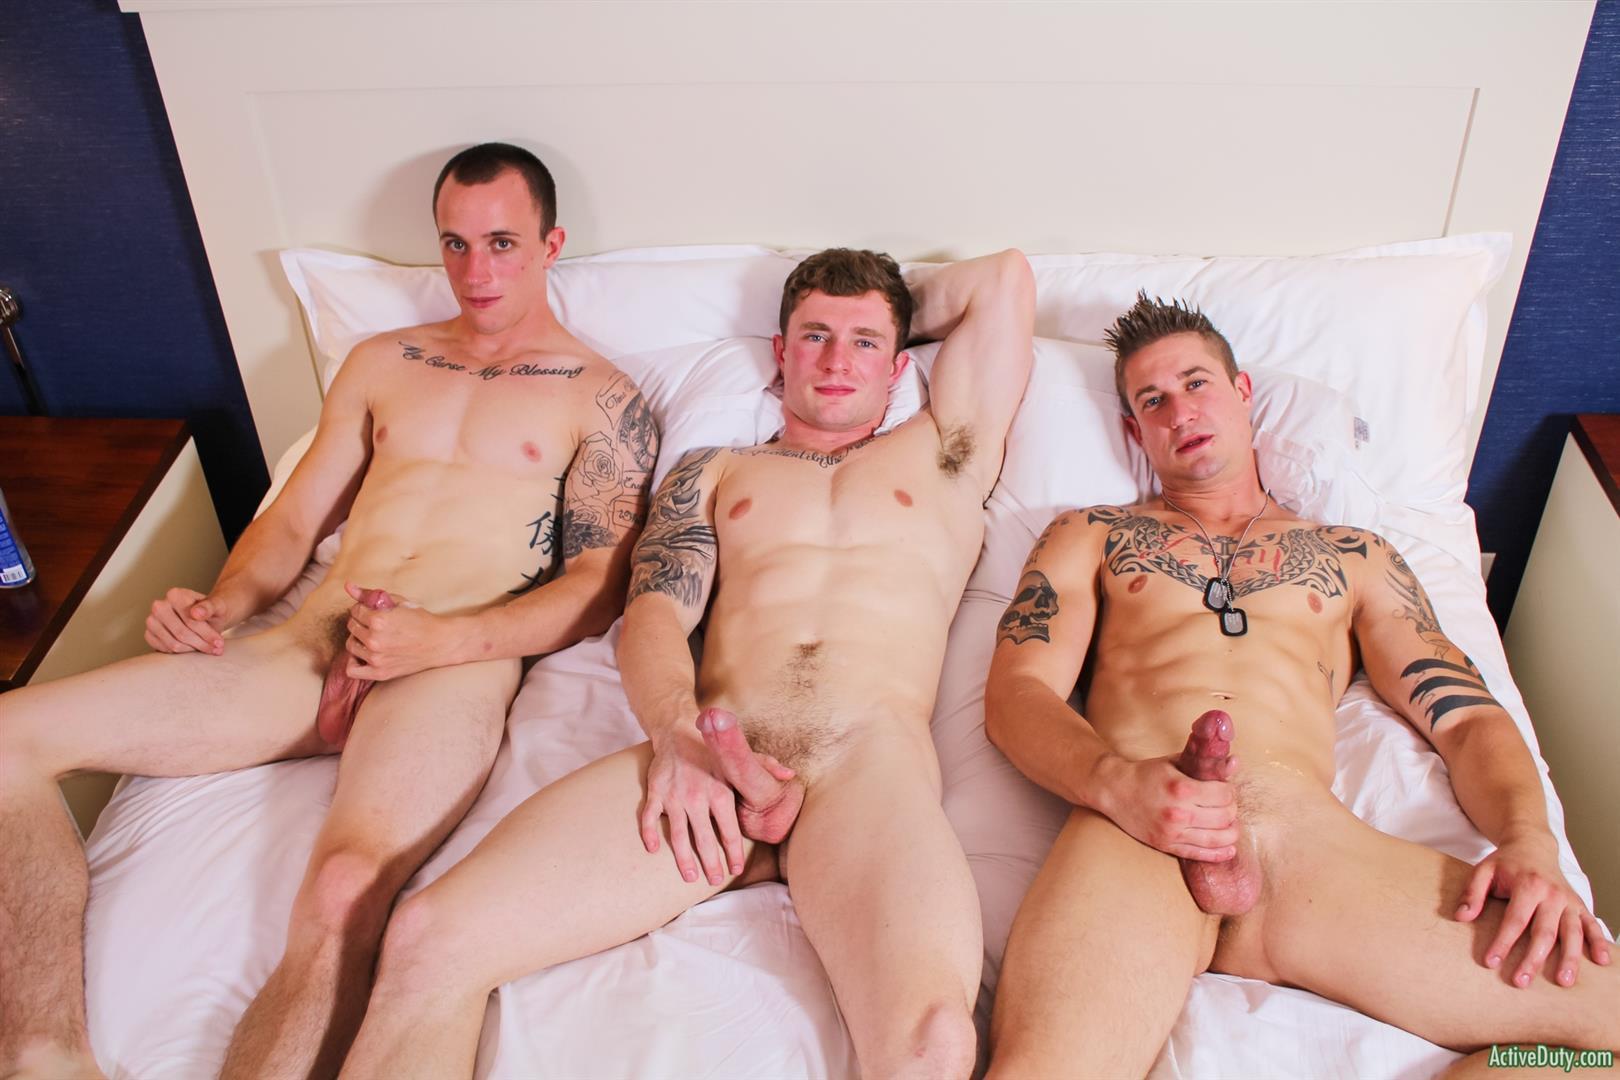 Active Duty Threeway Army Guys Bareback Sex Video Amateur Gay Porn 15 Big Dick Muscular Army Guys In A Bareback Threeway